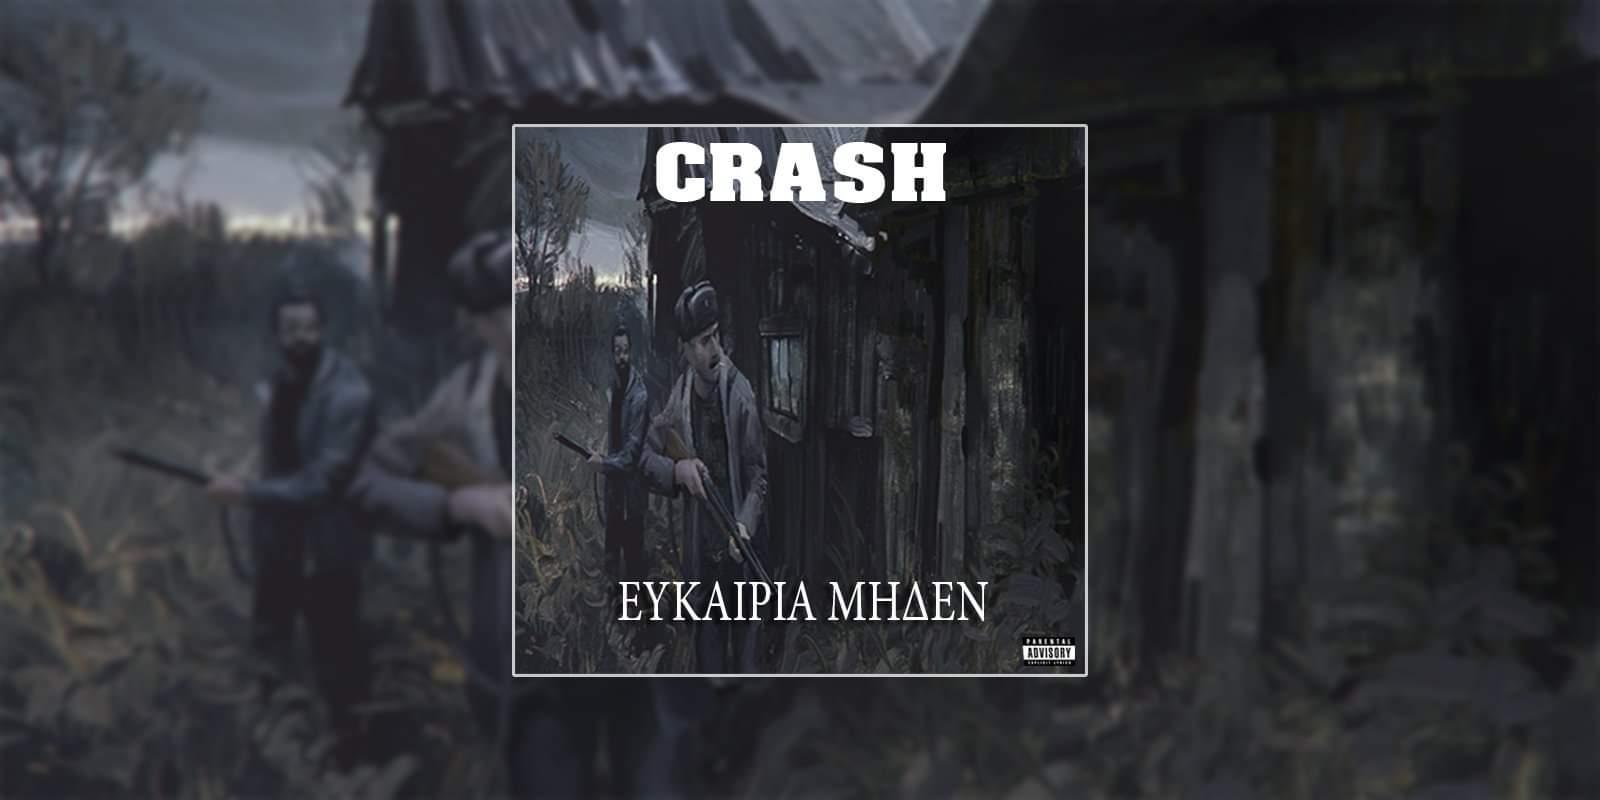 Crash - Ευκαιρία μηδέν | Συνέντευξη